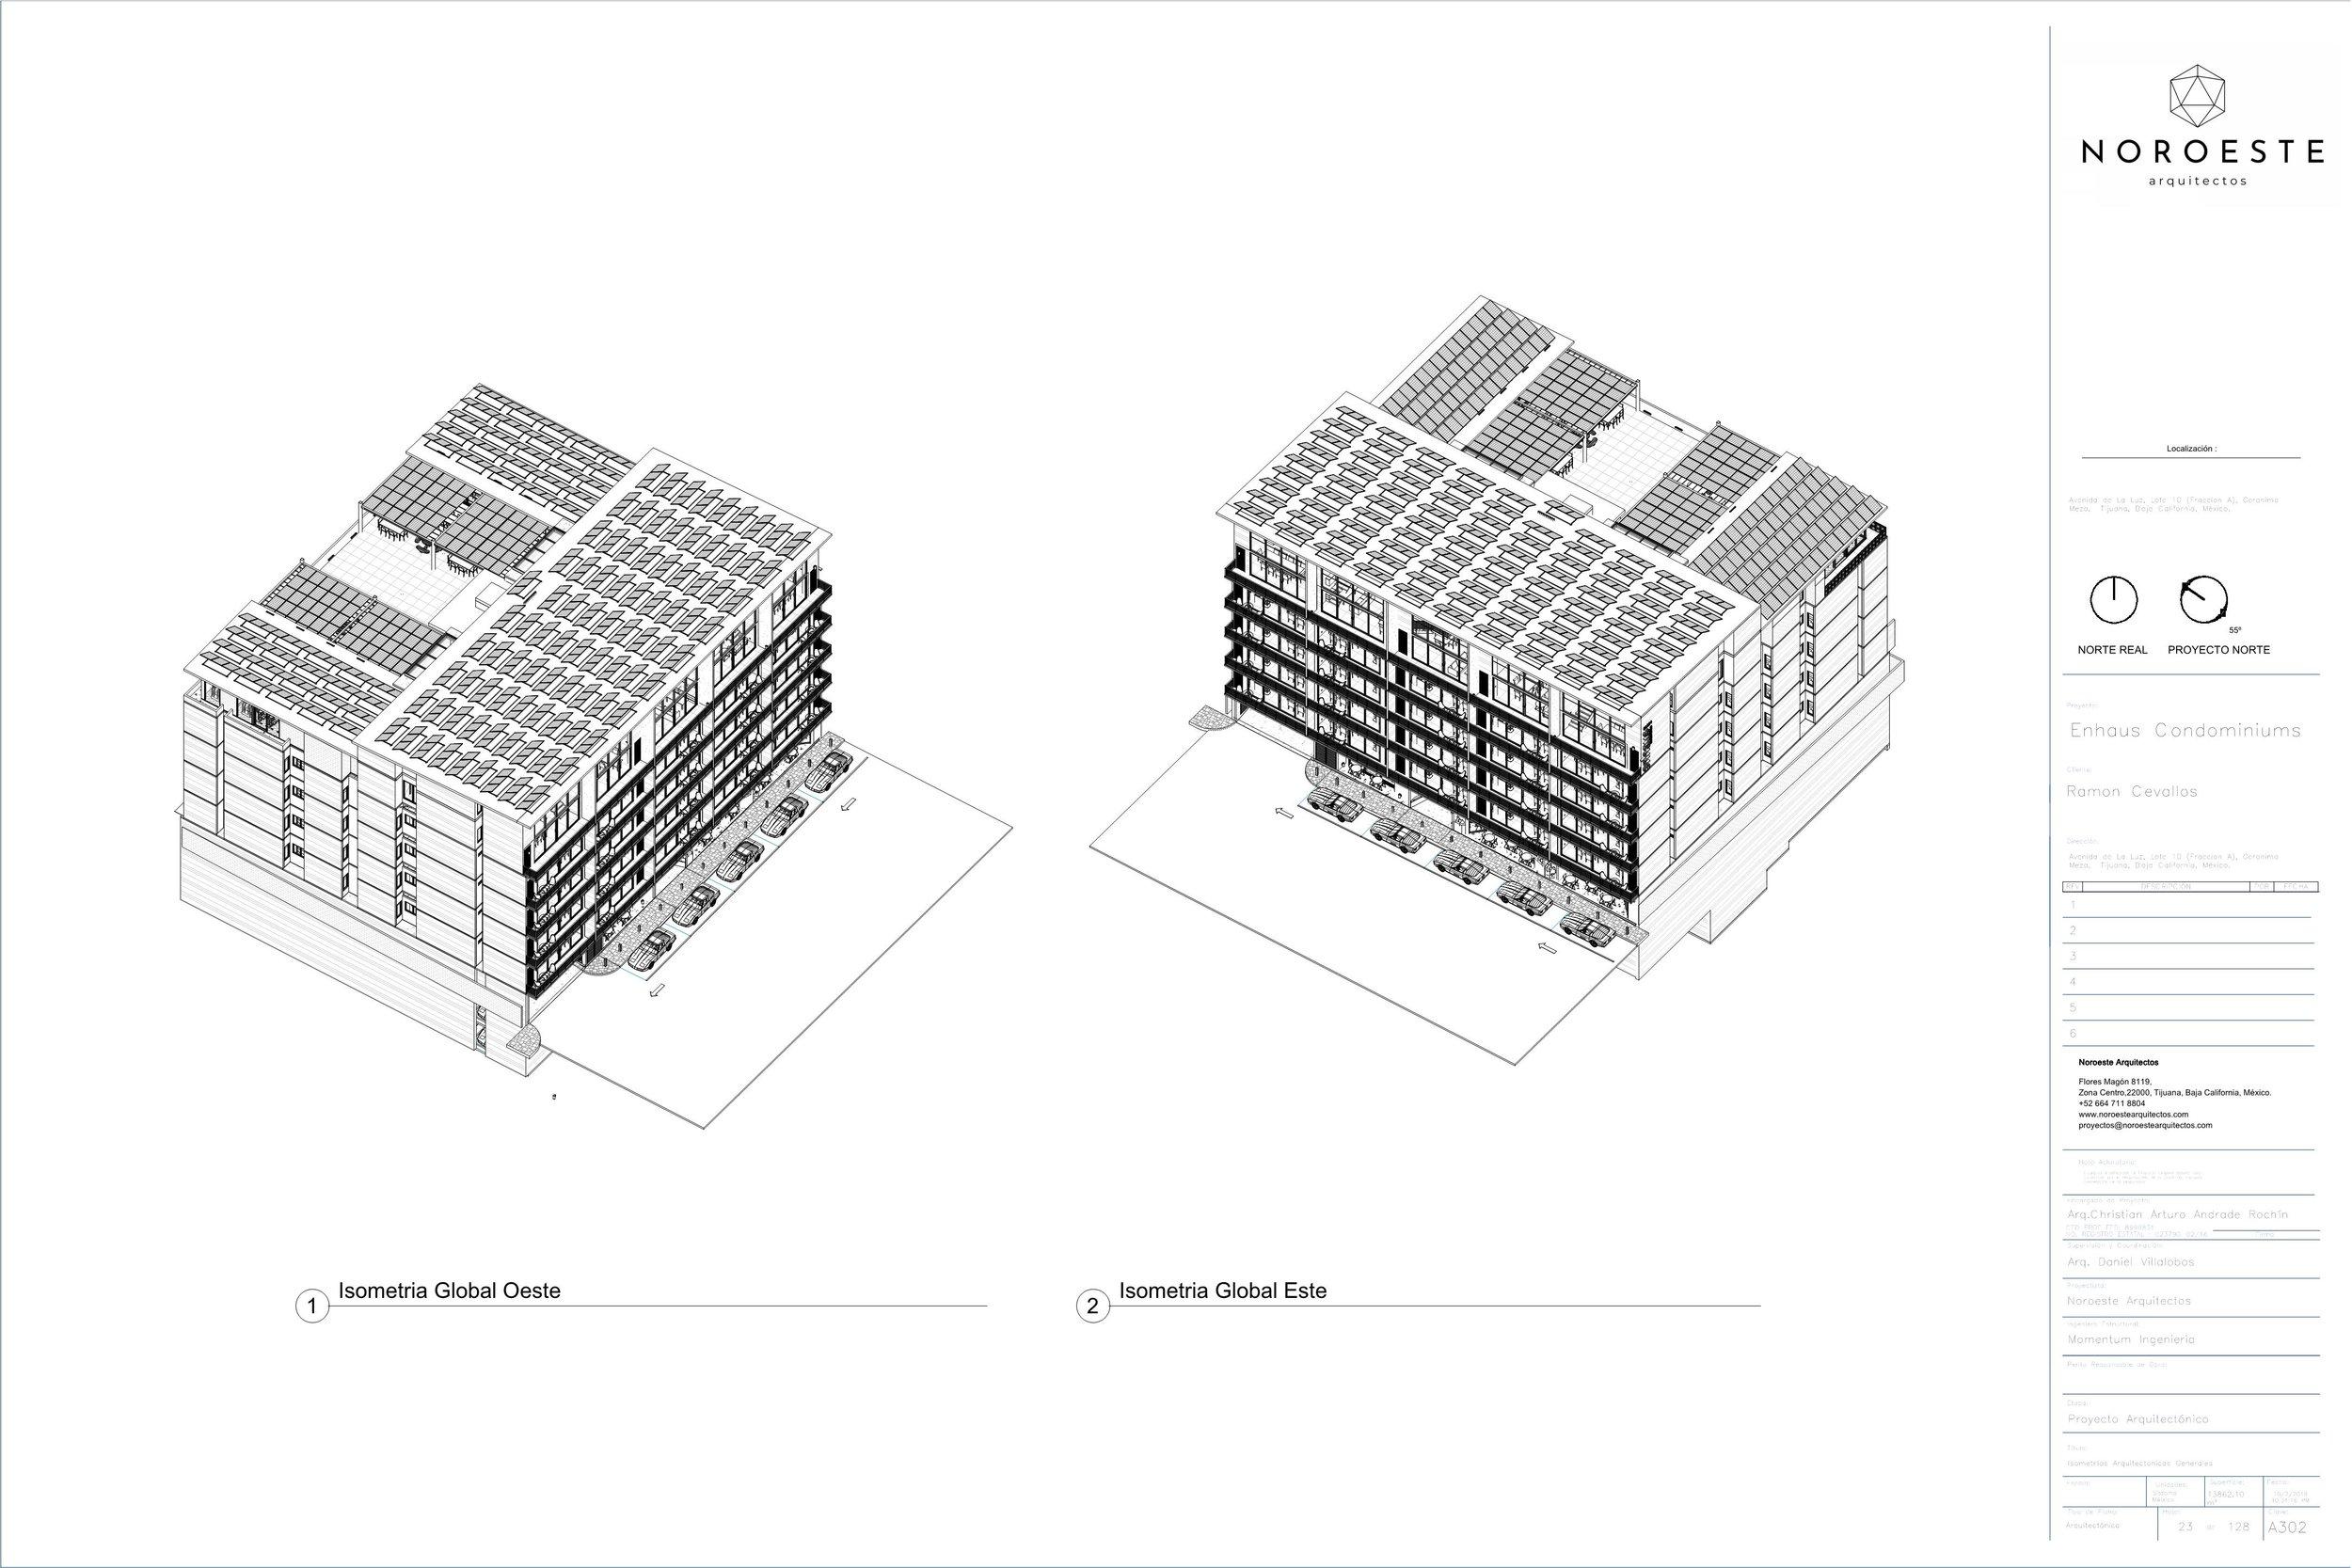 23 - A302 - Isometrías Arquitectonicas Generales.jpg